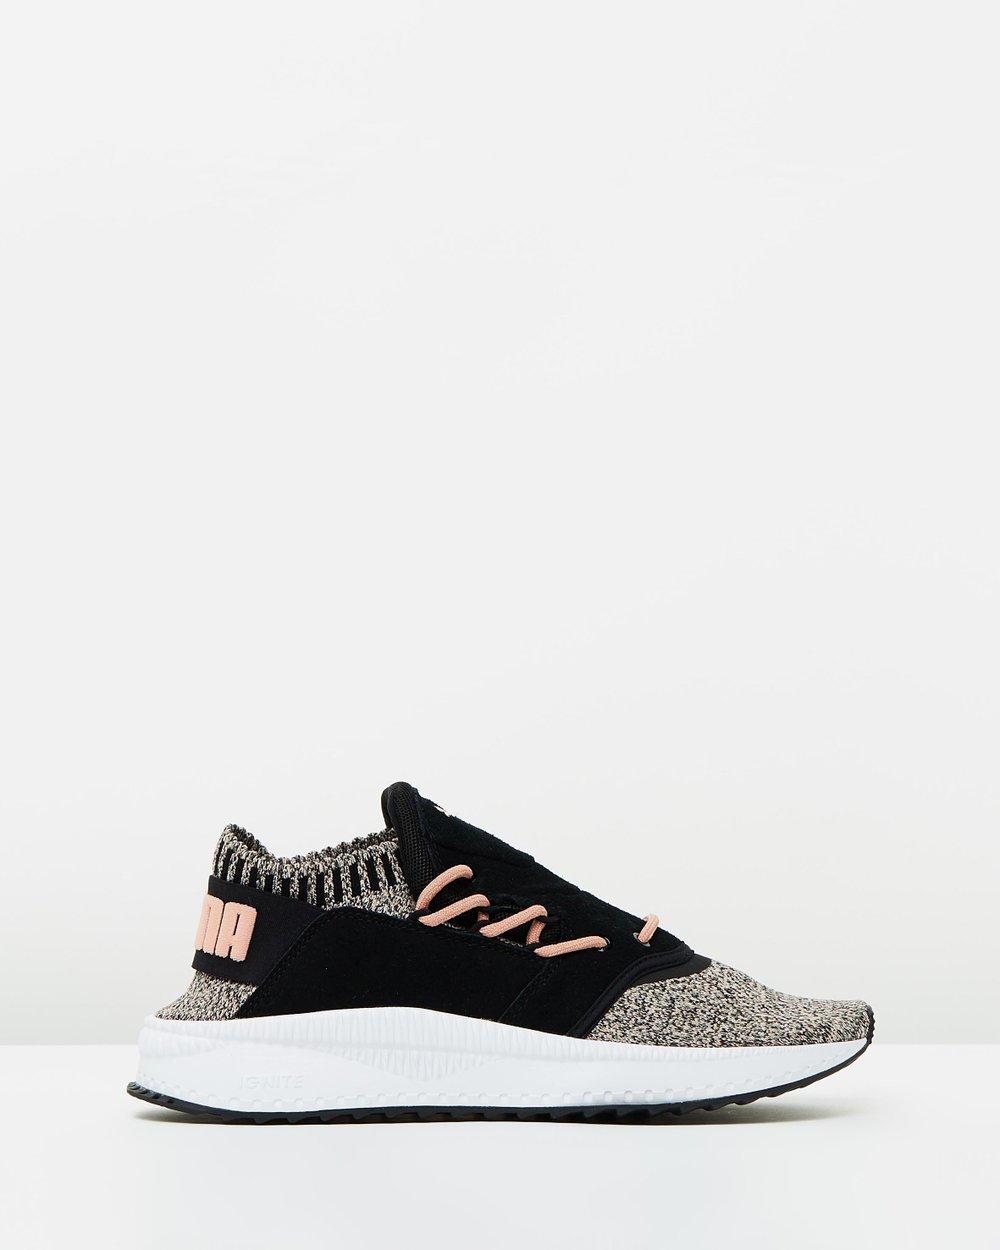 fc592d06bc12ed Tsugi Shinsei Evoknit Sneakers - Women s by Puma Online